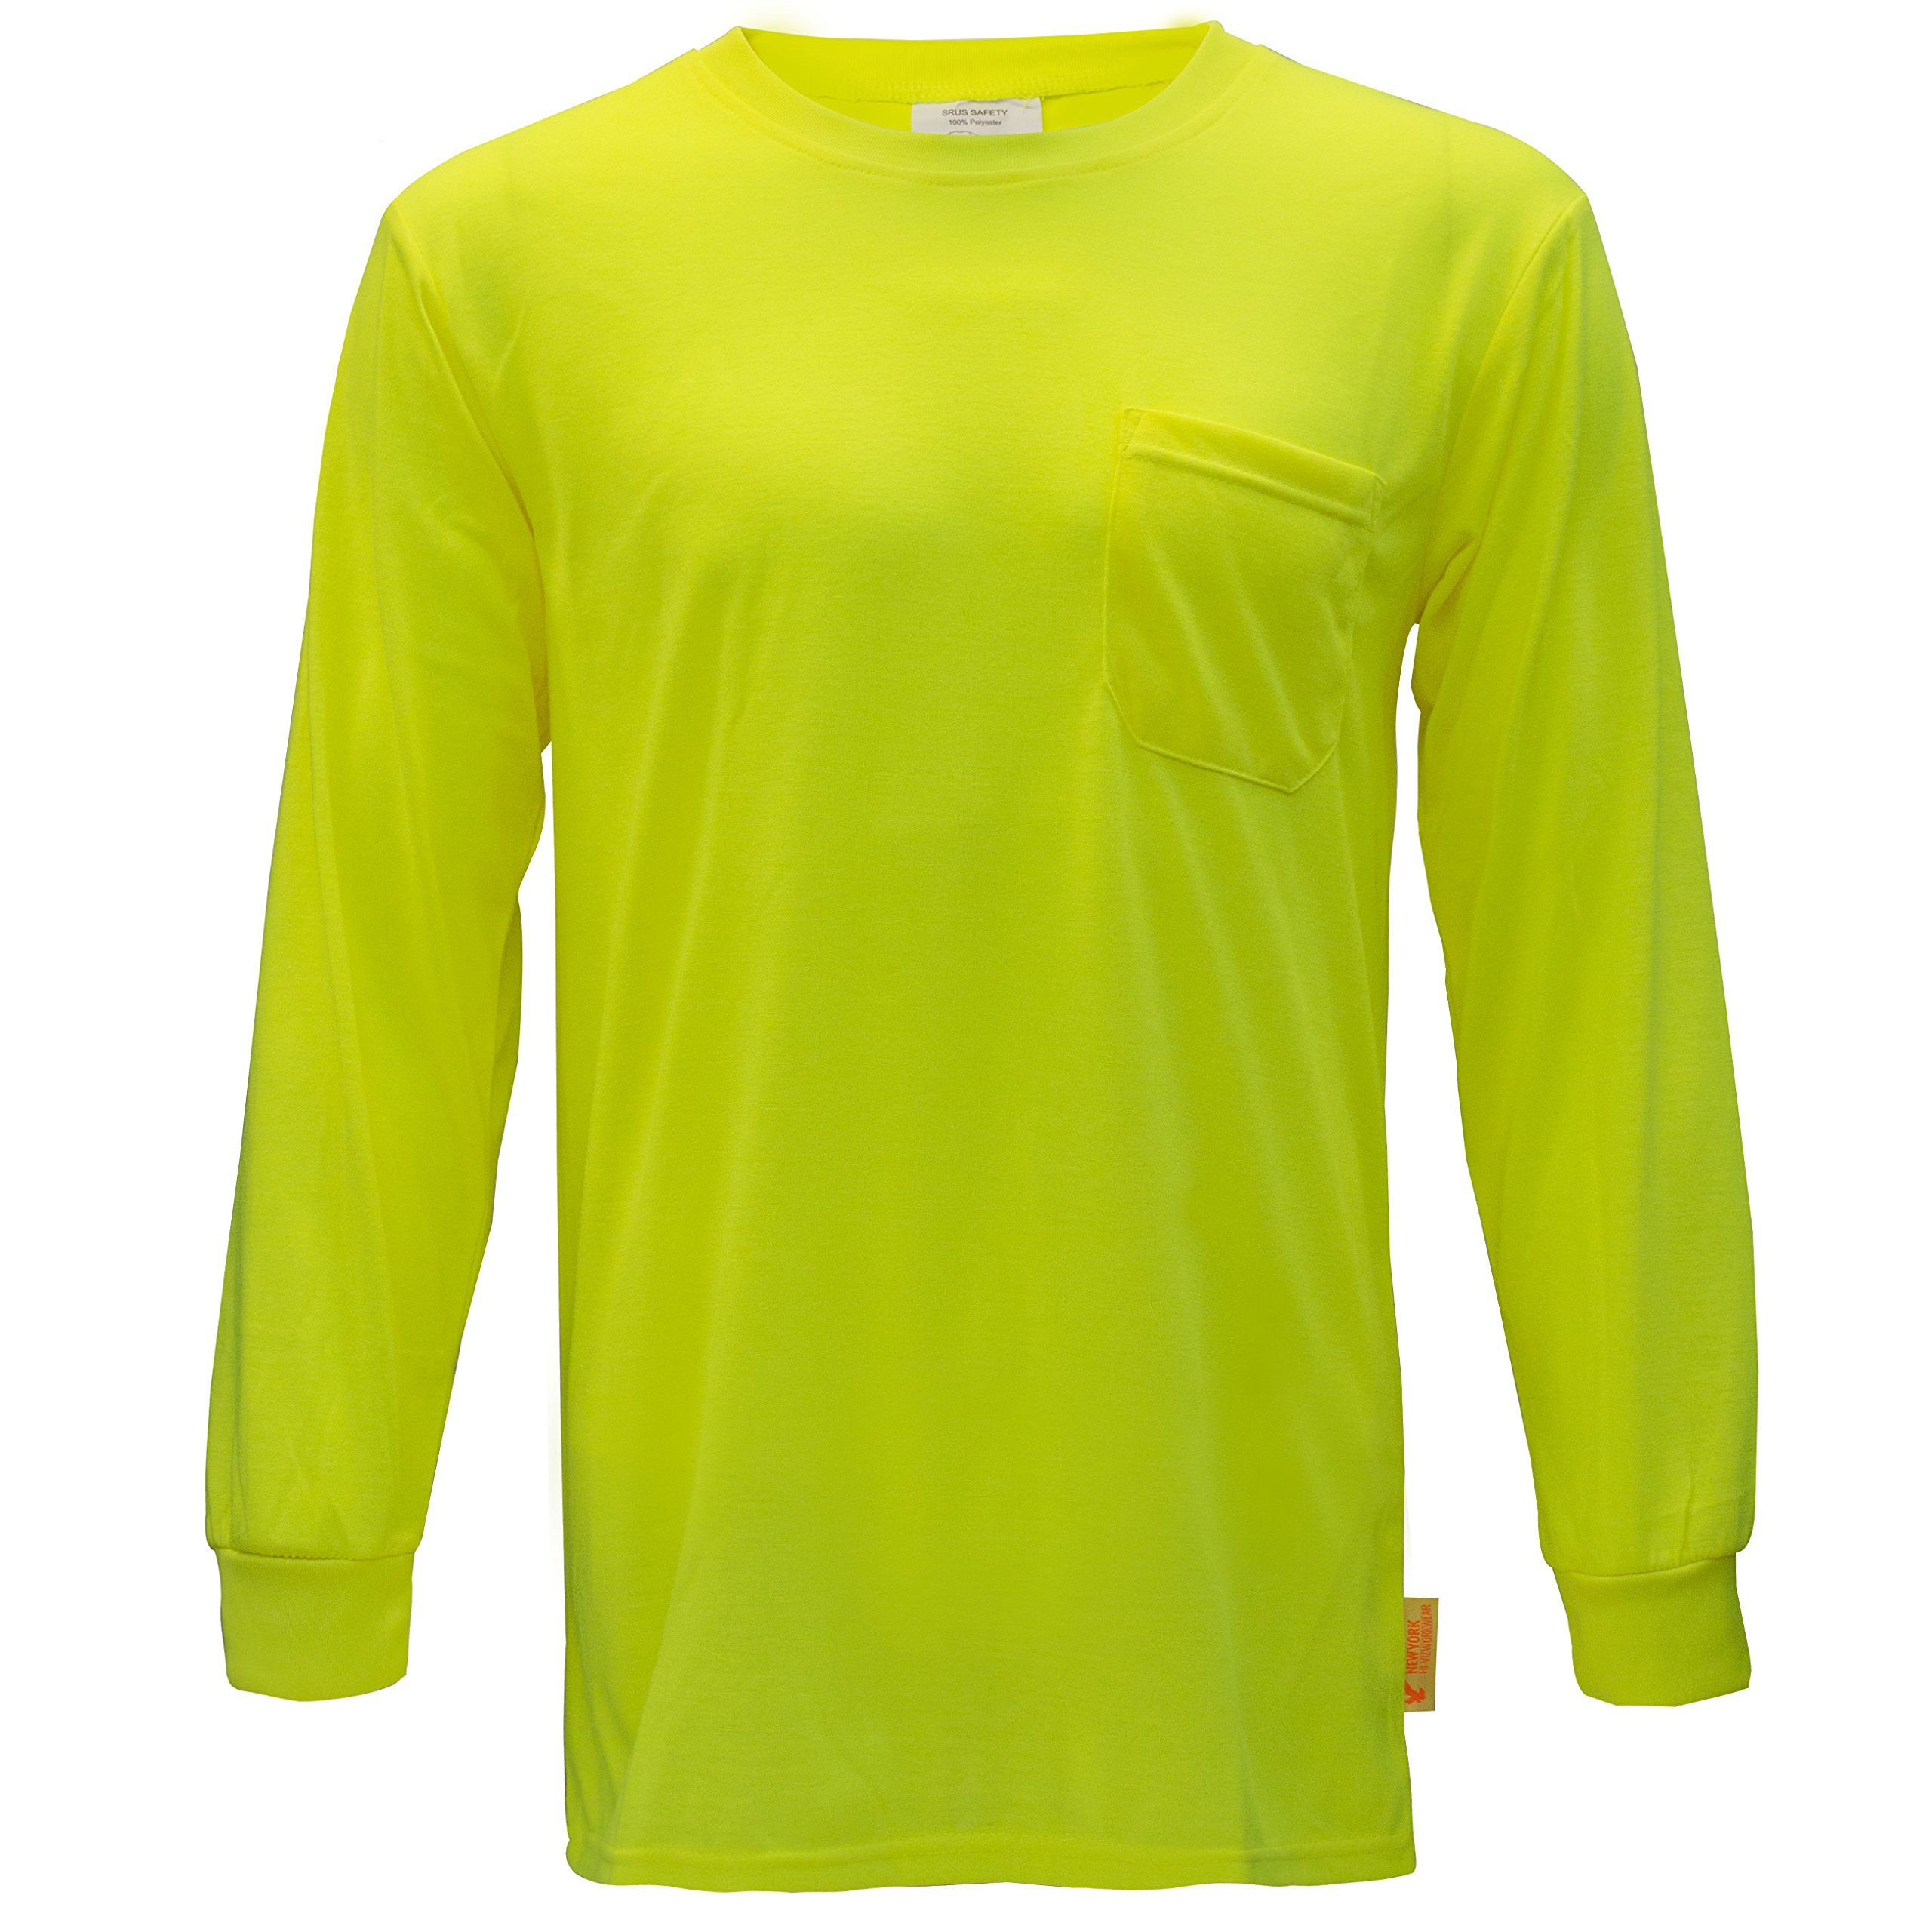 NY Hi-Viz Workwear L2110 Long Sleeve High-Visibility Force Color Enhanced Safety Shirt (Extra Large, Neon Yellow)